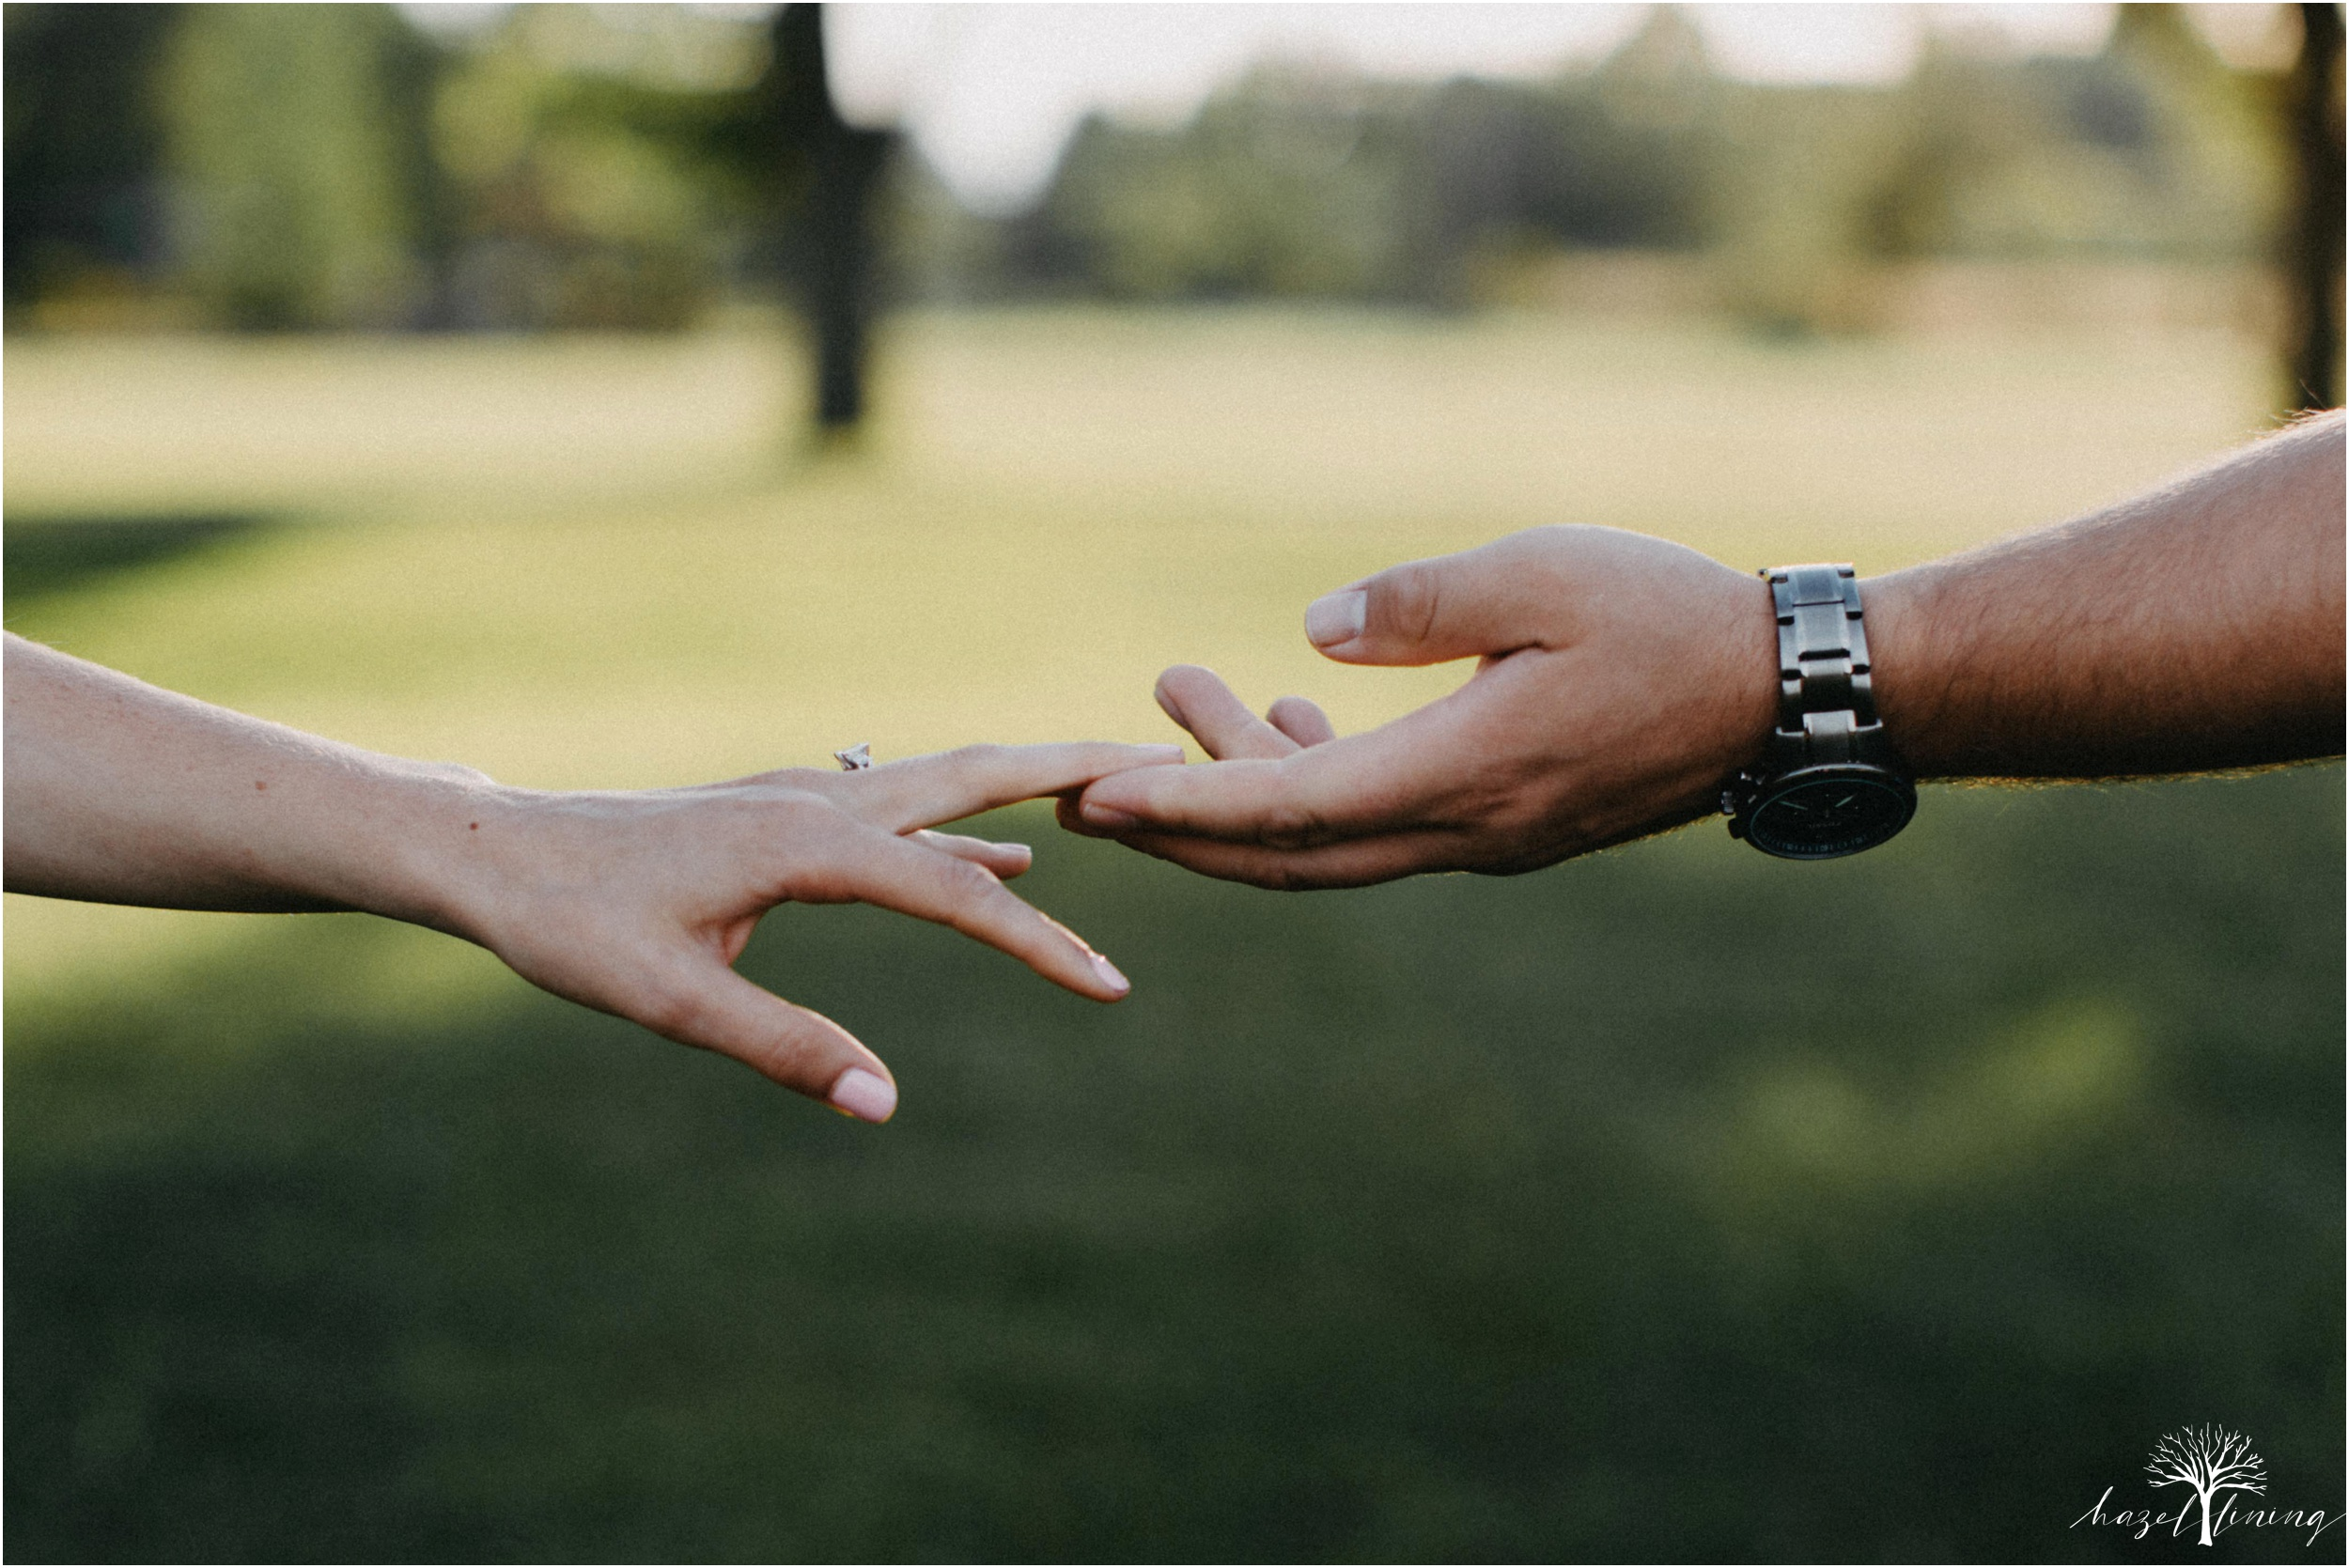 rachel-warner-chris-niedrist-the-farm-bakery-and-events-quakertown-pa-summer-engagement-hazel-lining-photography-destination-elopement-wedding-engagement-photography_0008.jpg